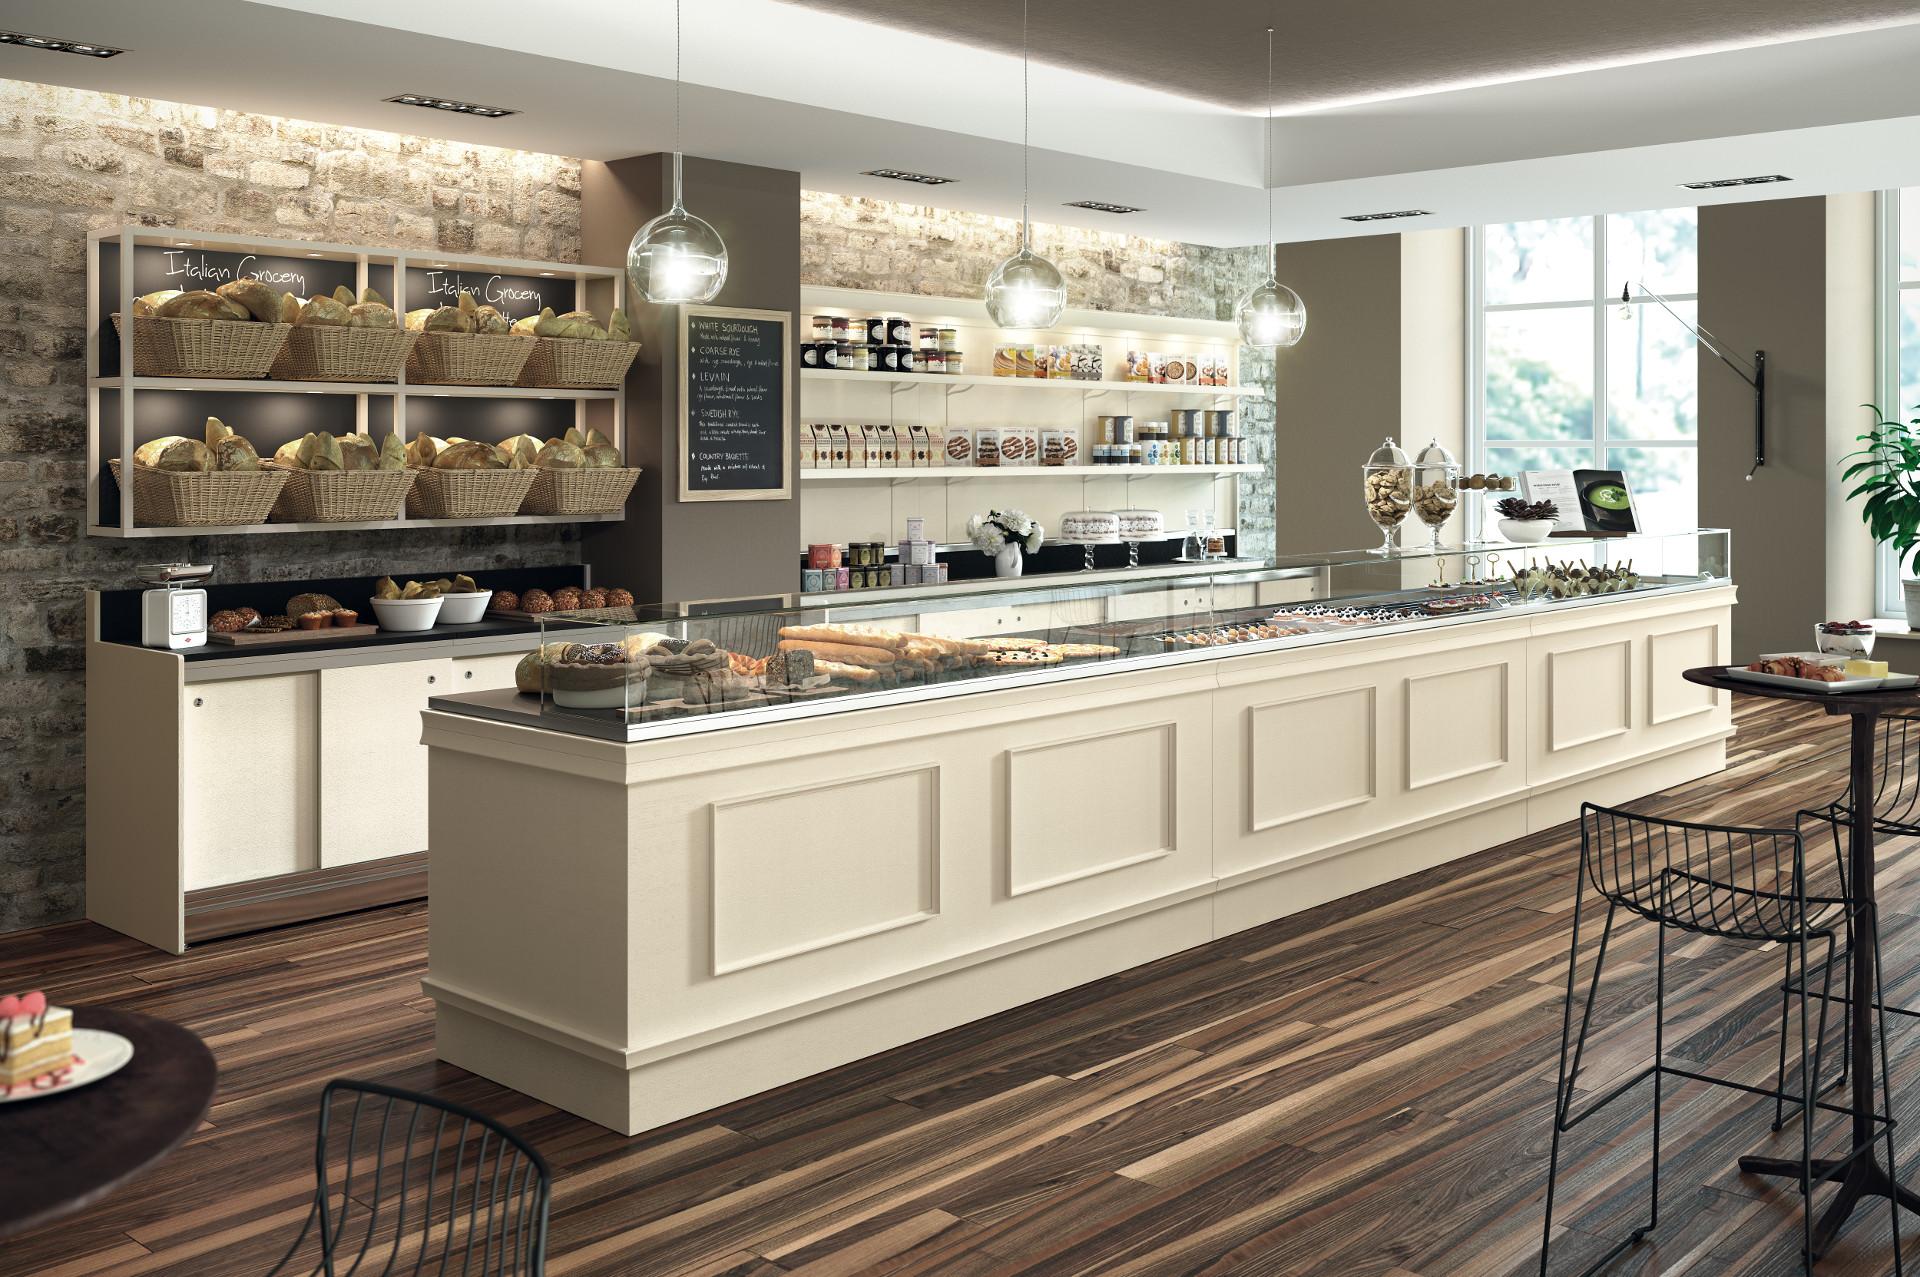 Arredamenti e attrezzature per bar ristoranti gelaterie for Arredamenti per panifici